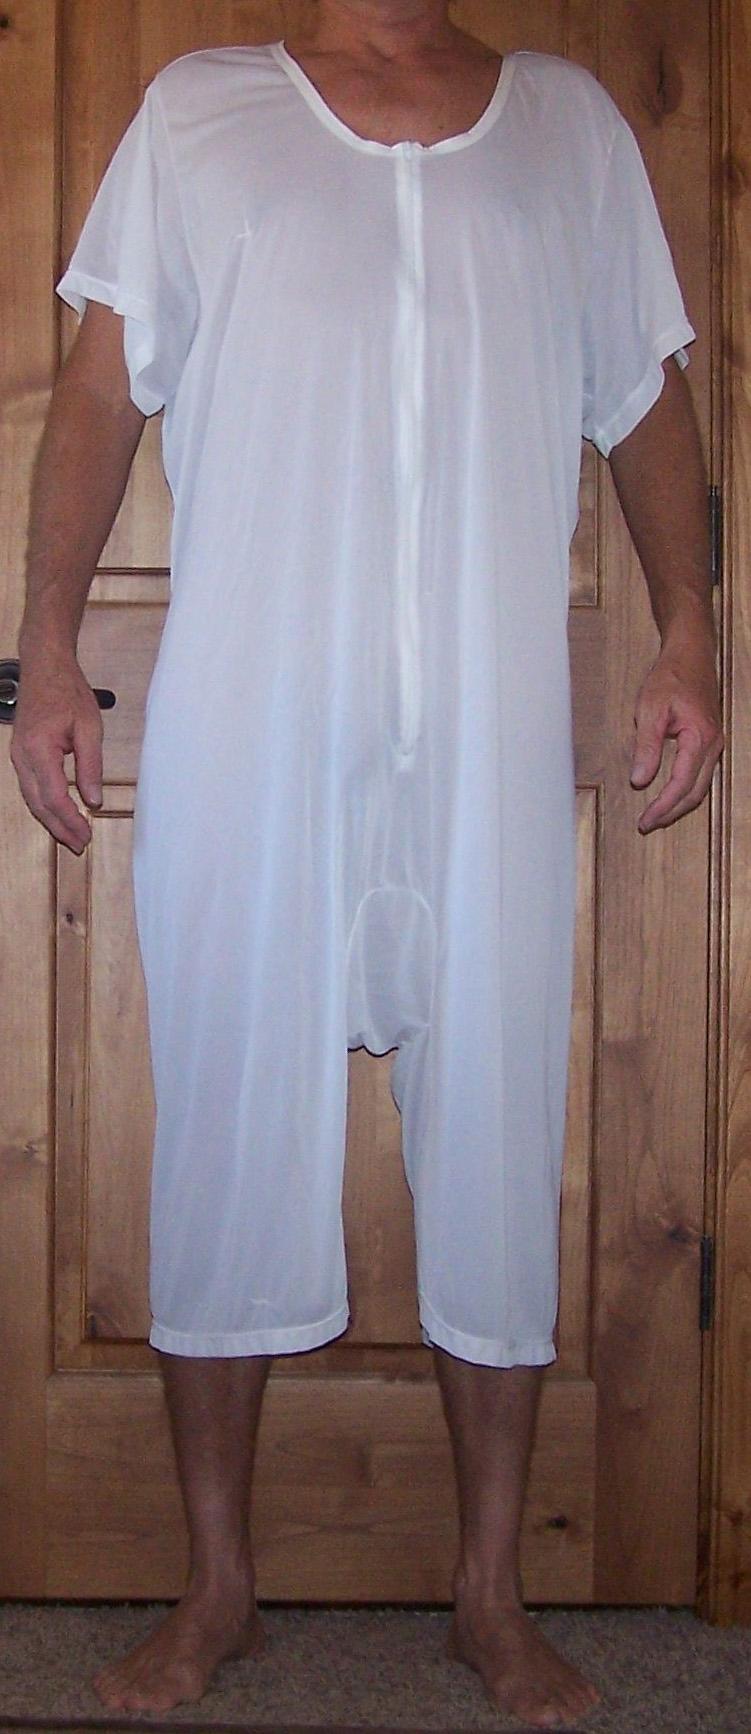 underwear temple garments Mormon